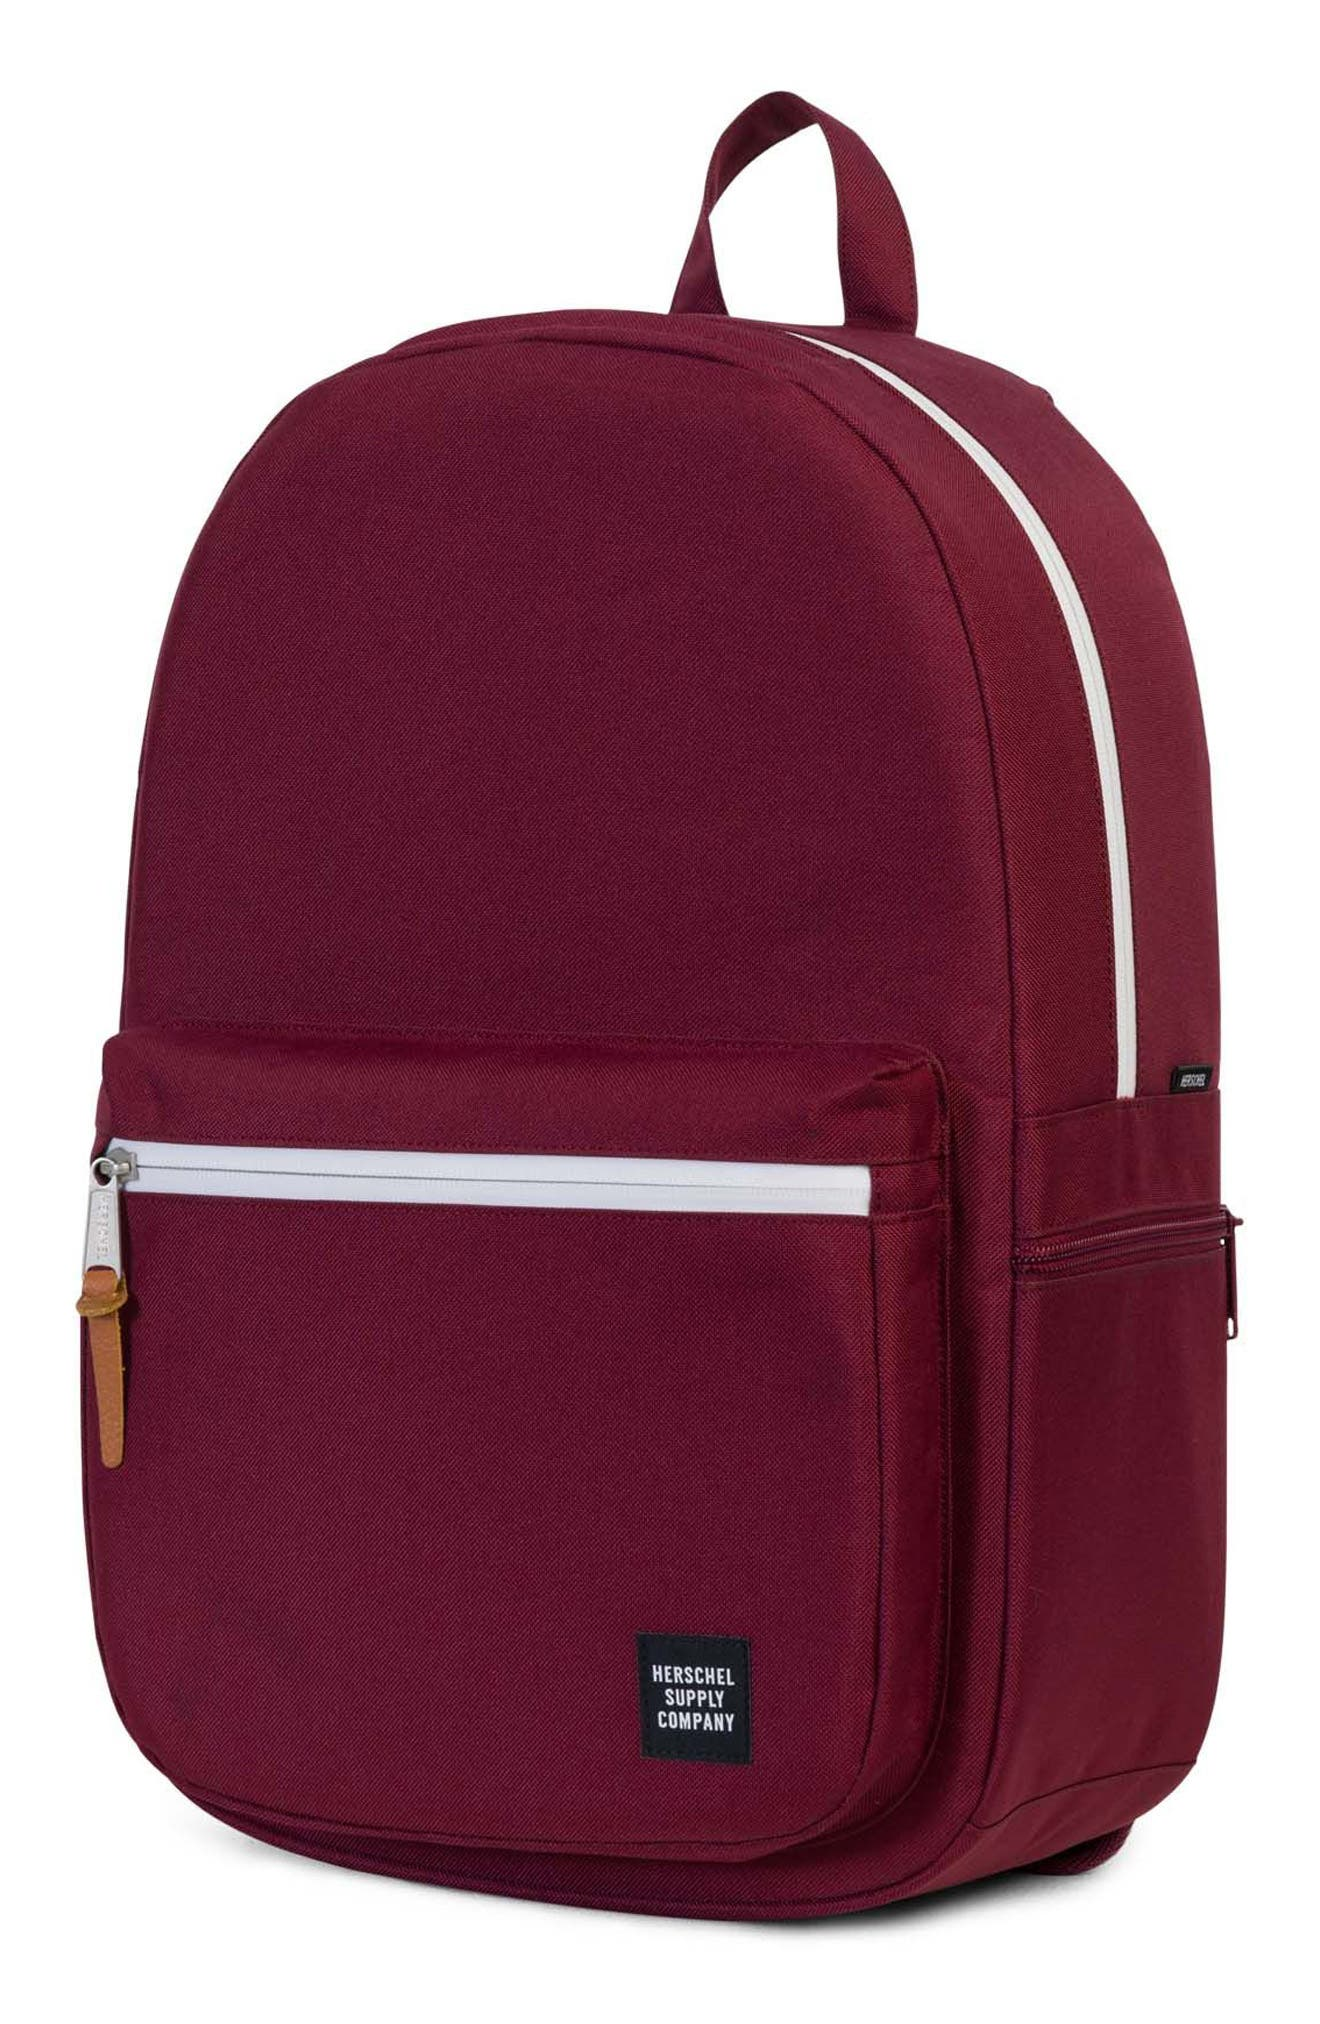 Harrison Backpack,                             Alternate thumbnail 2, color,                             613